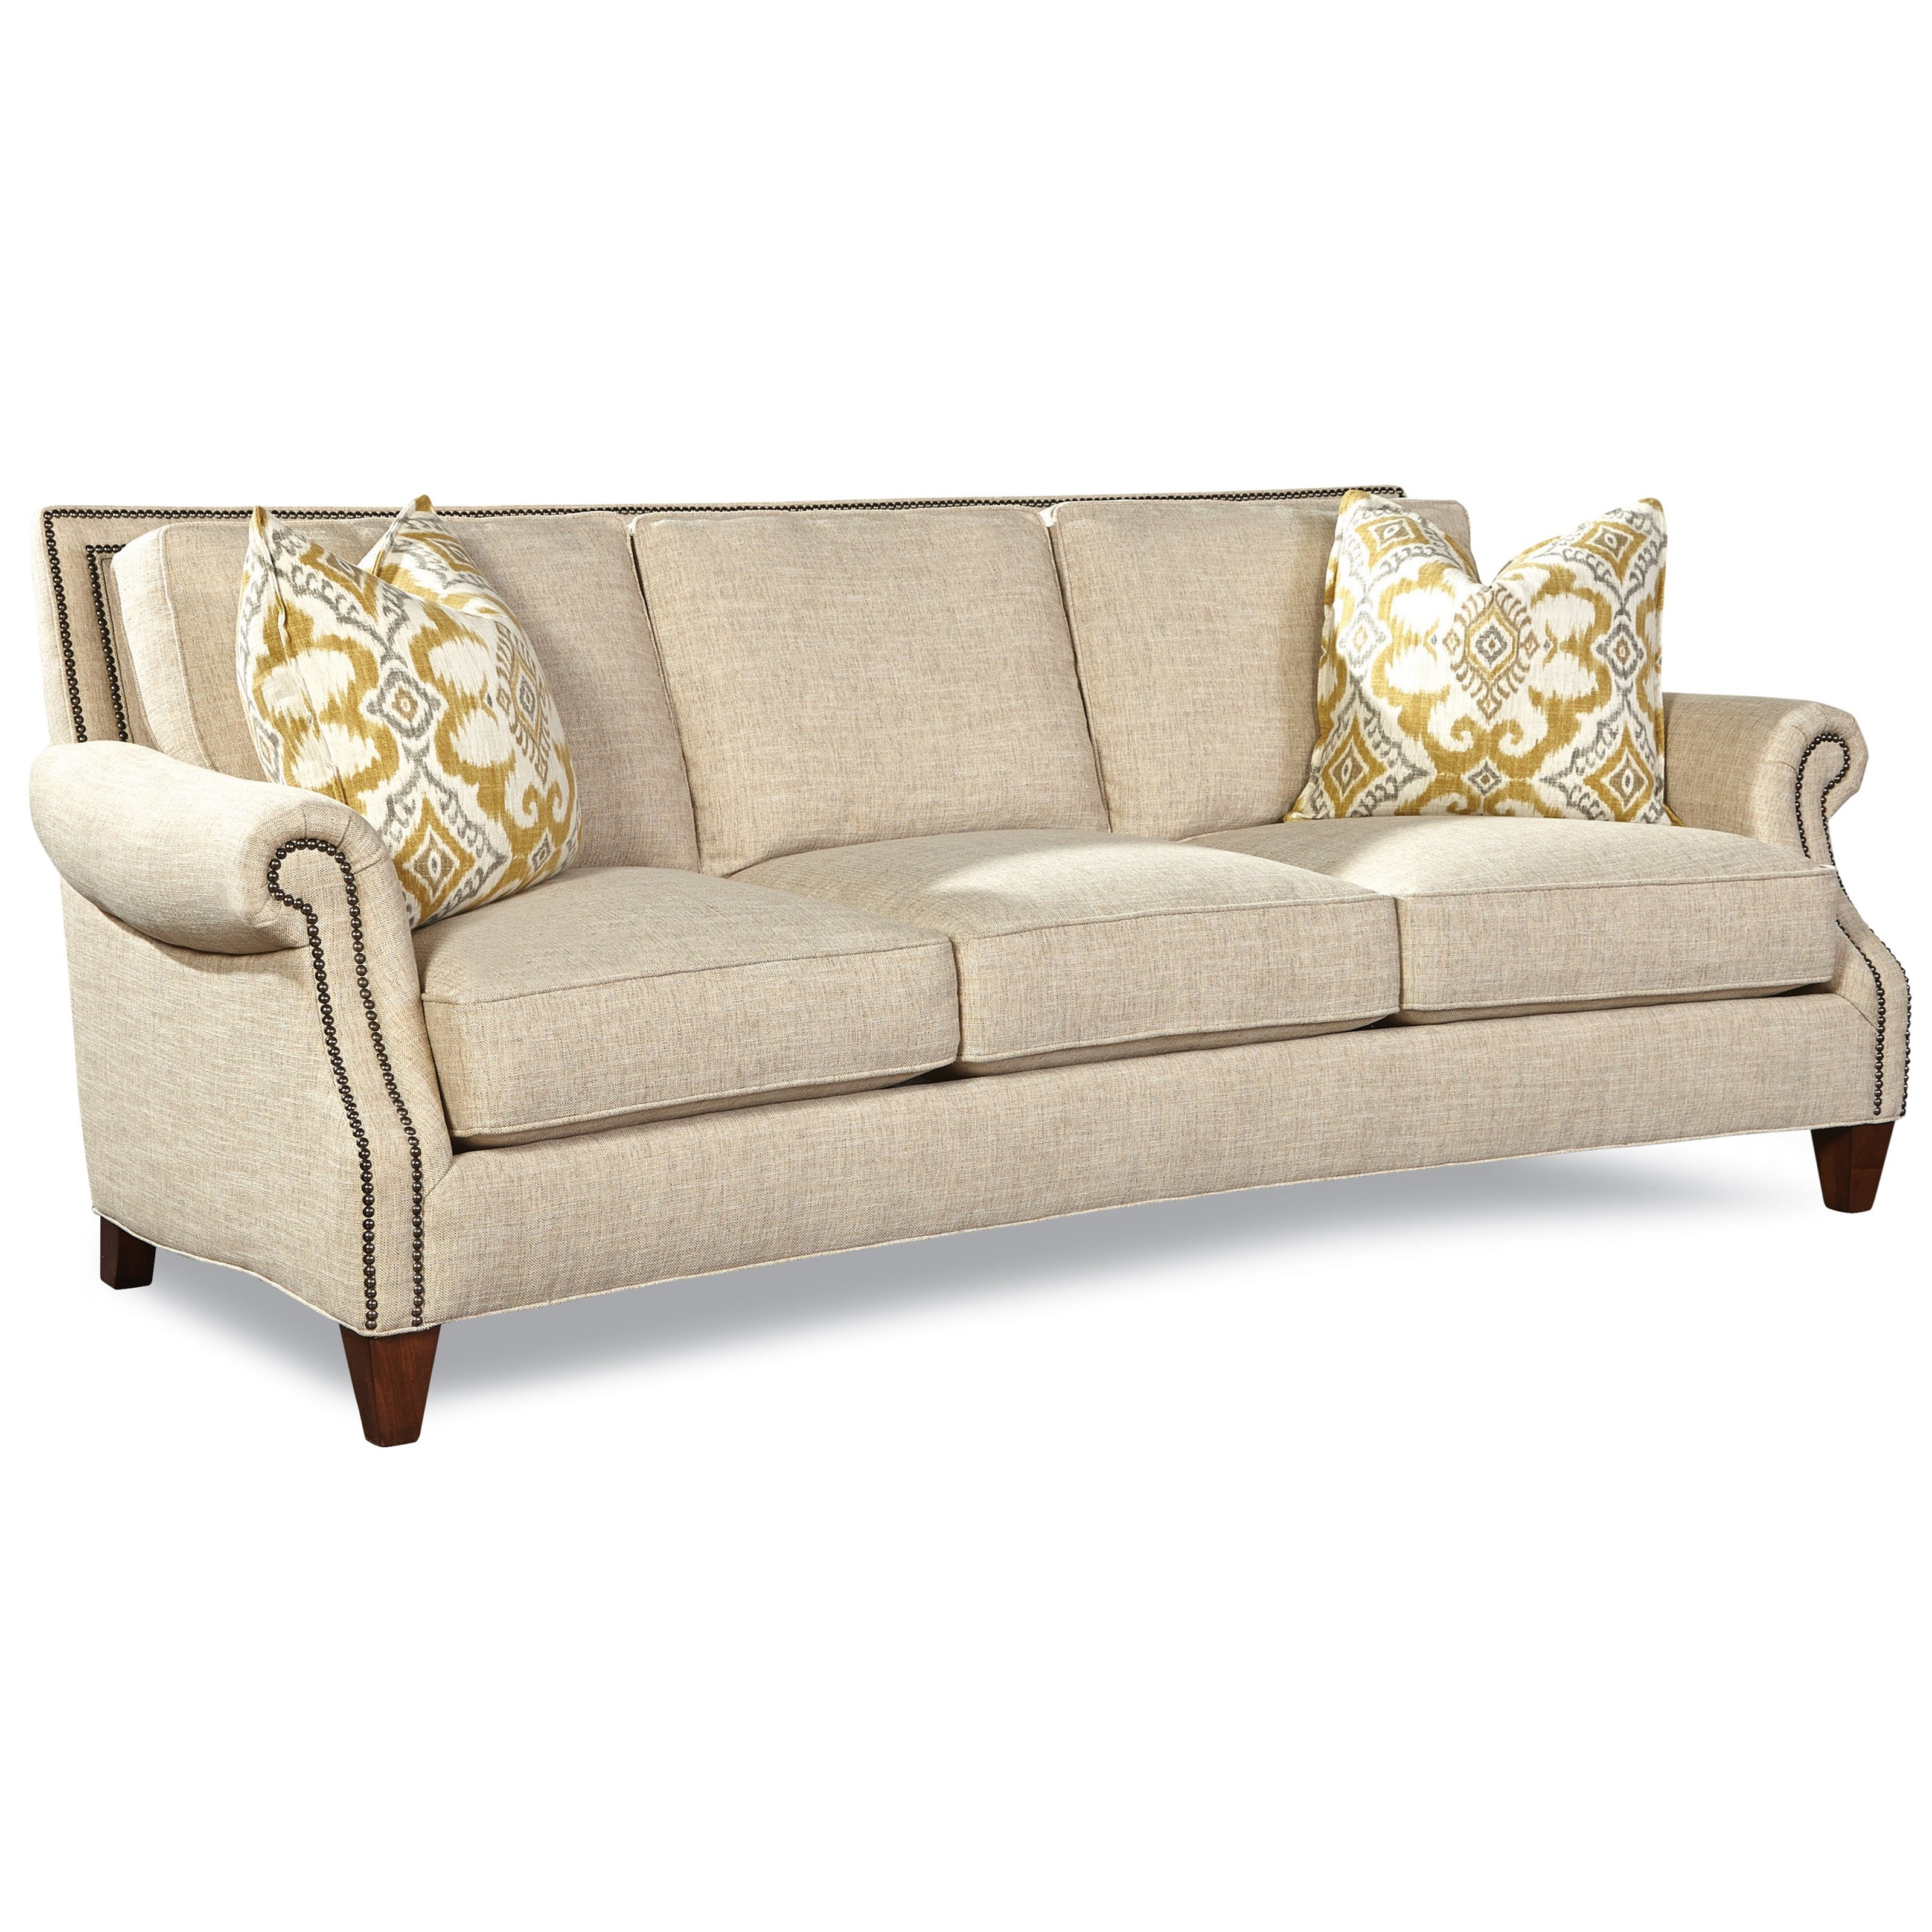 7249 Sofa by Geoffrey Alexander at Sprintz Furniture